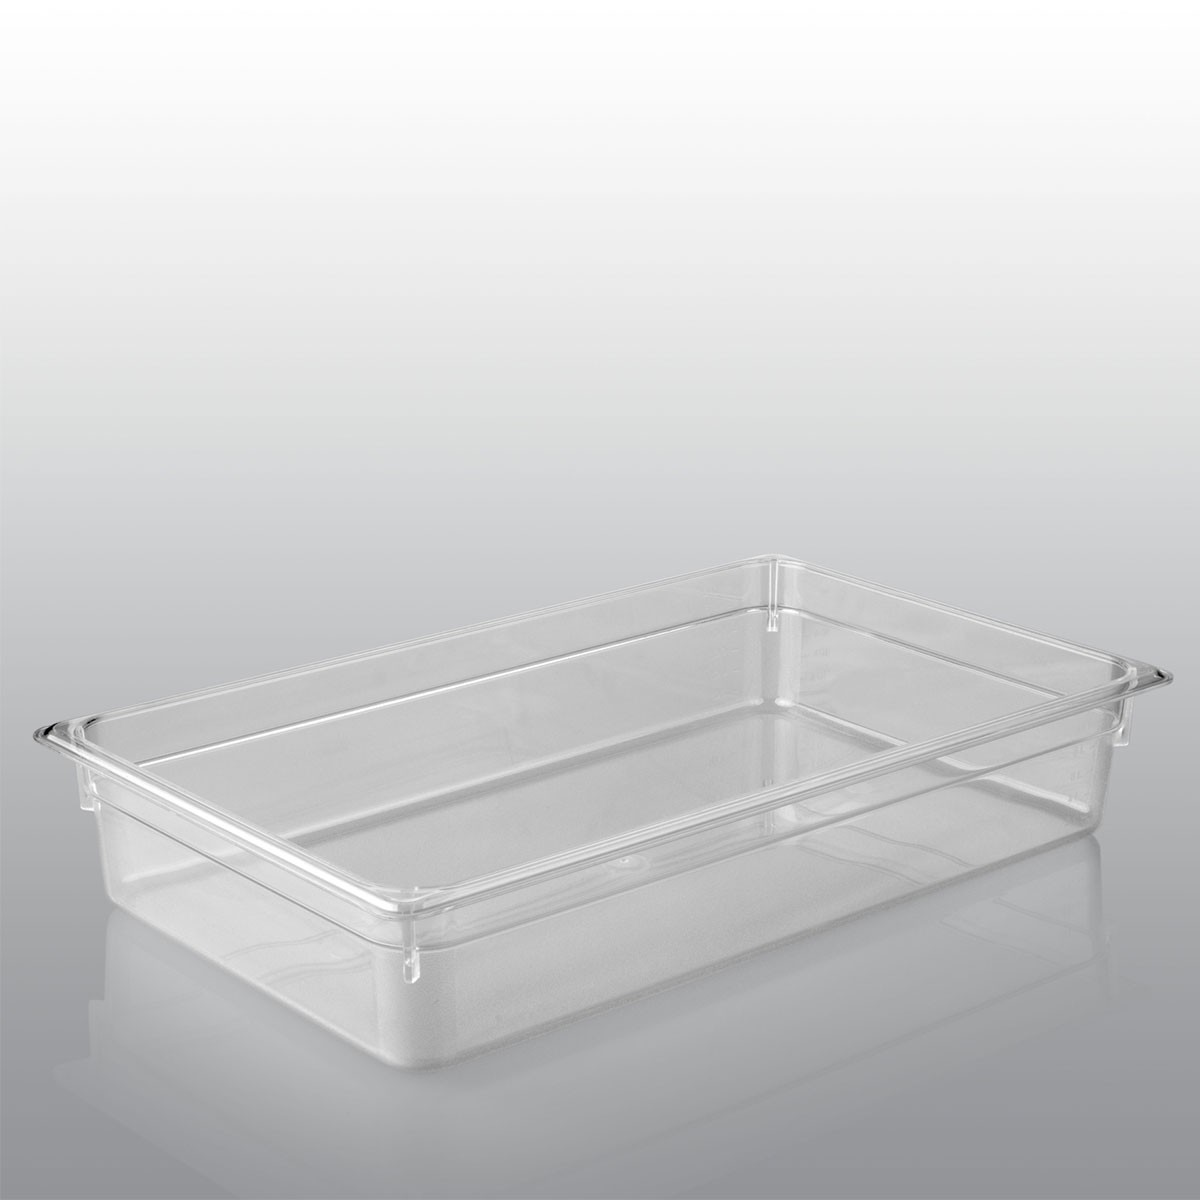 GN Behälter GN 1/1 aus Polycarbonat (Tiefe: 100mm) 14,0 L Saro